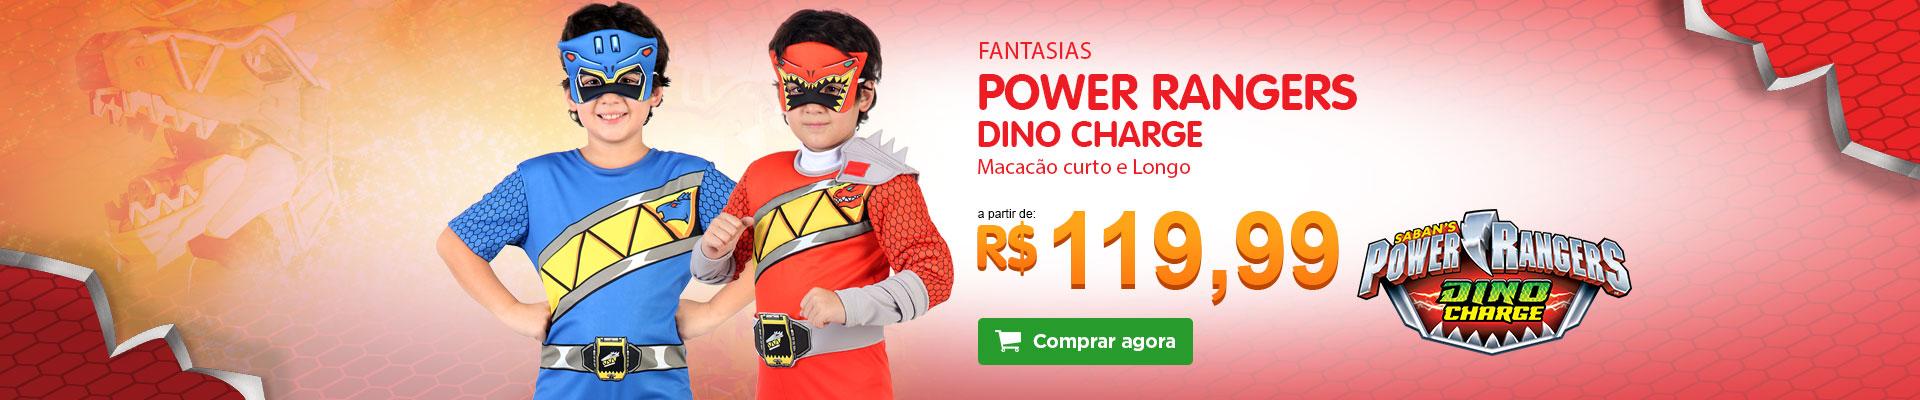 Power Rangers Dino